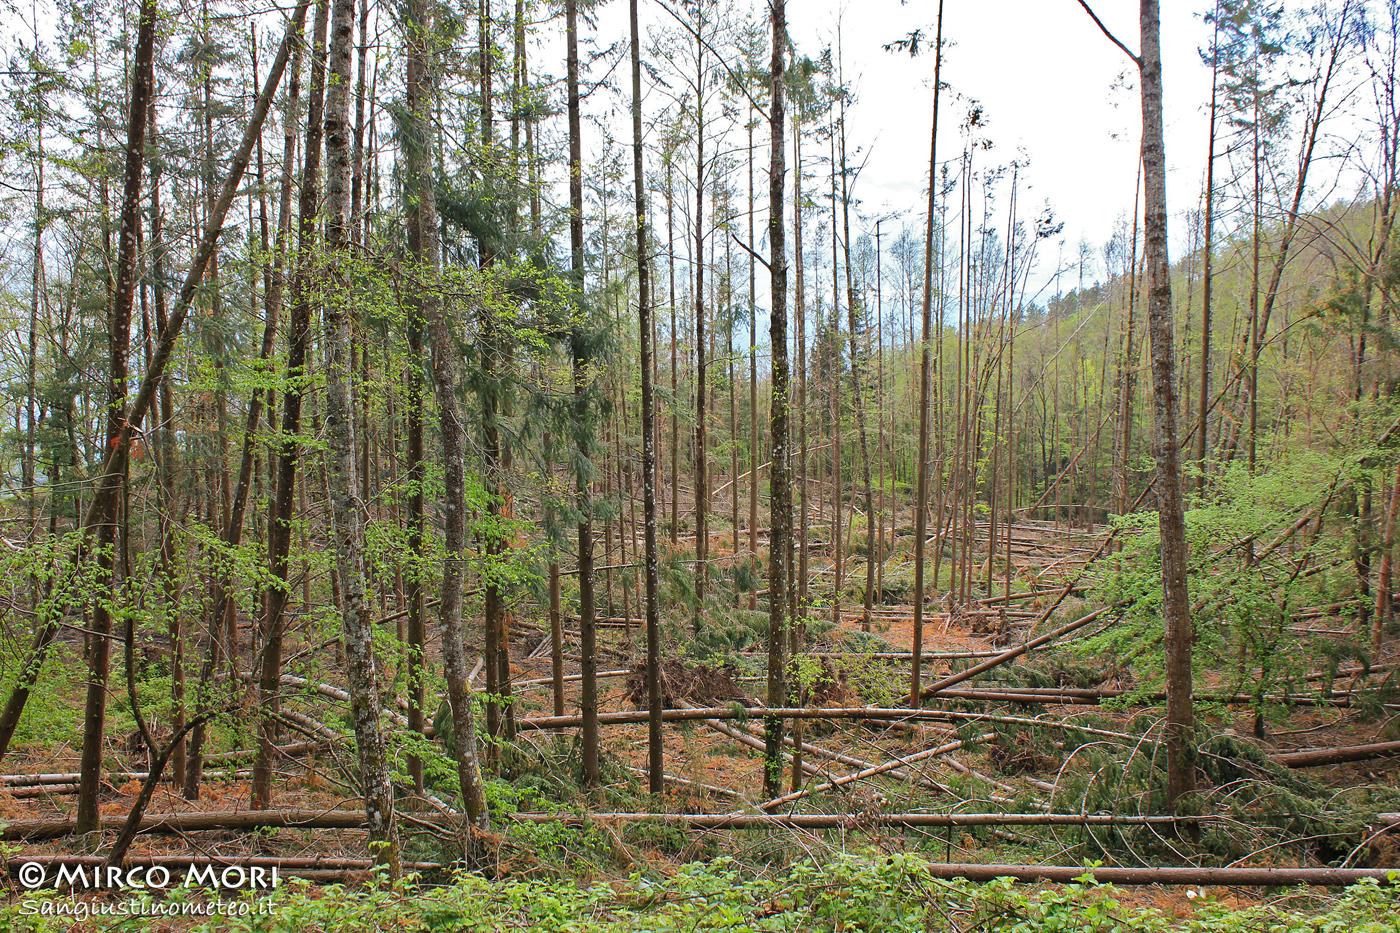 Tempesta vento 5 Marzo 2015 Sansepolcro sangiustinometeo